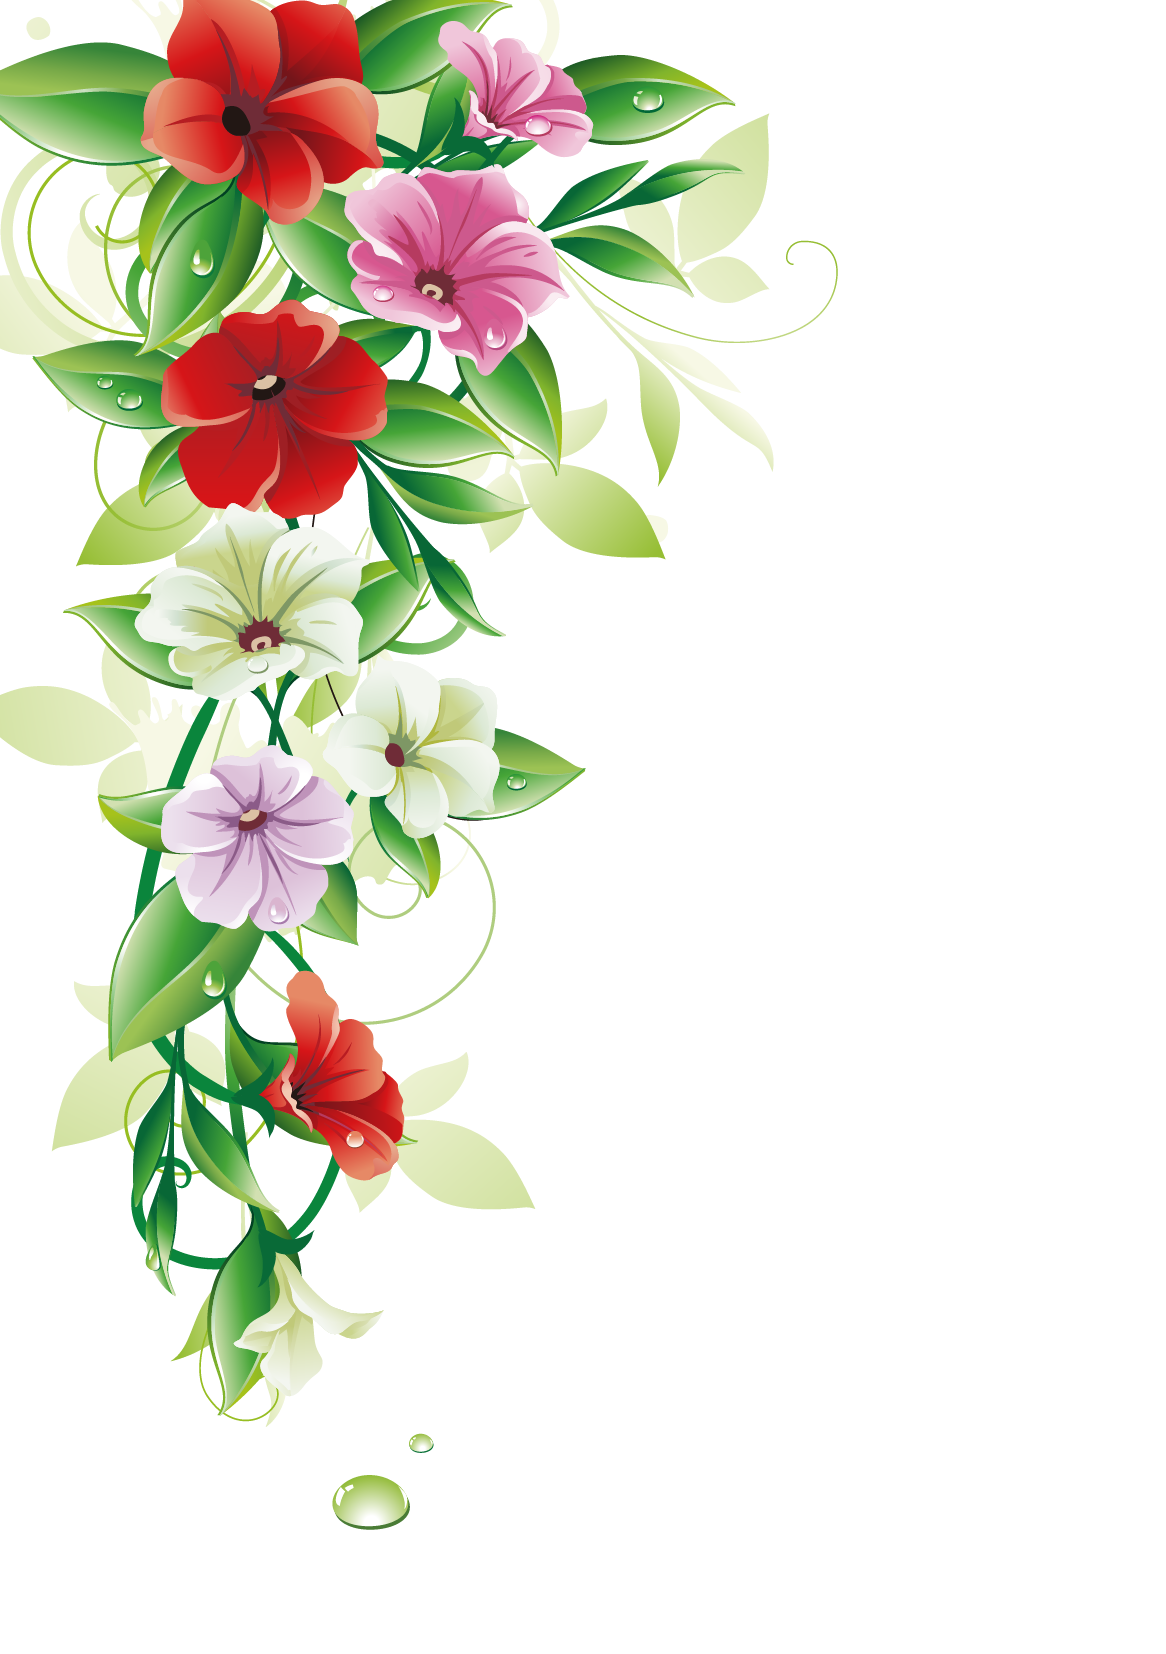 Flower bouquet border clipart picture royalty free library Flower Clip art - Flower Border 1166*1654 transprent Png Free ... picture royalty free library